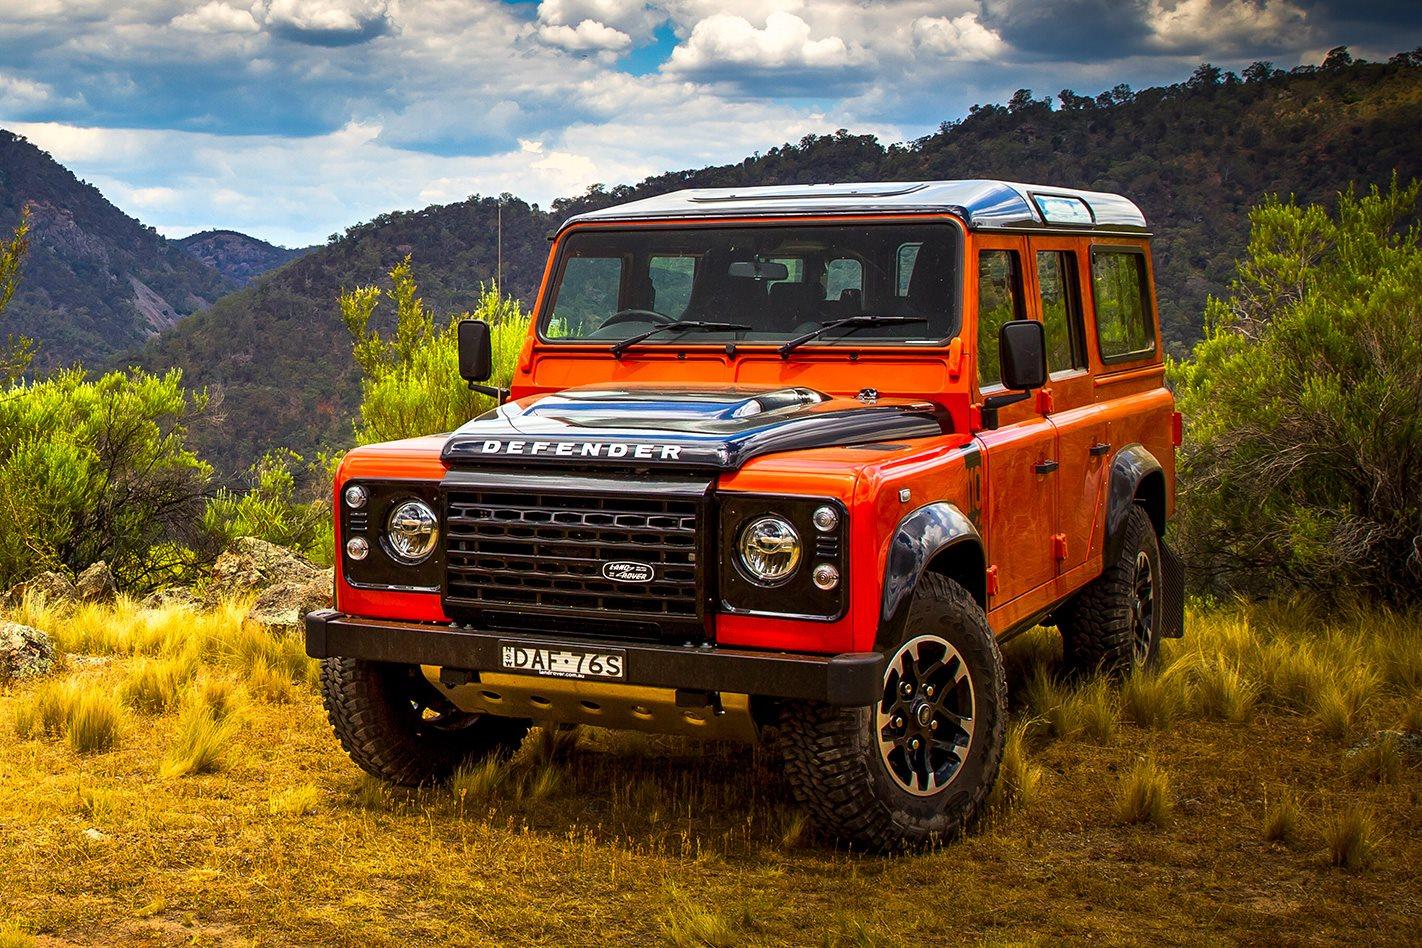 Land rover defender 110 adventure for Garage land rover villeneuve d ascq